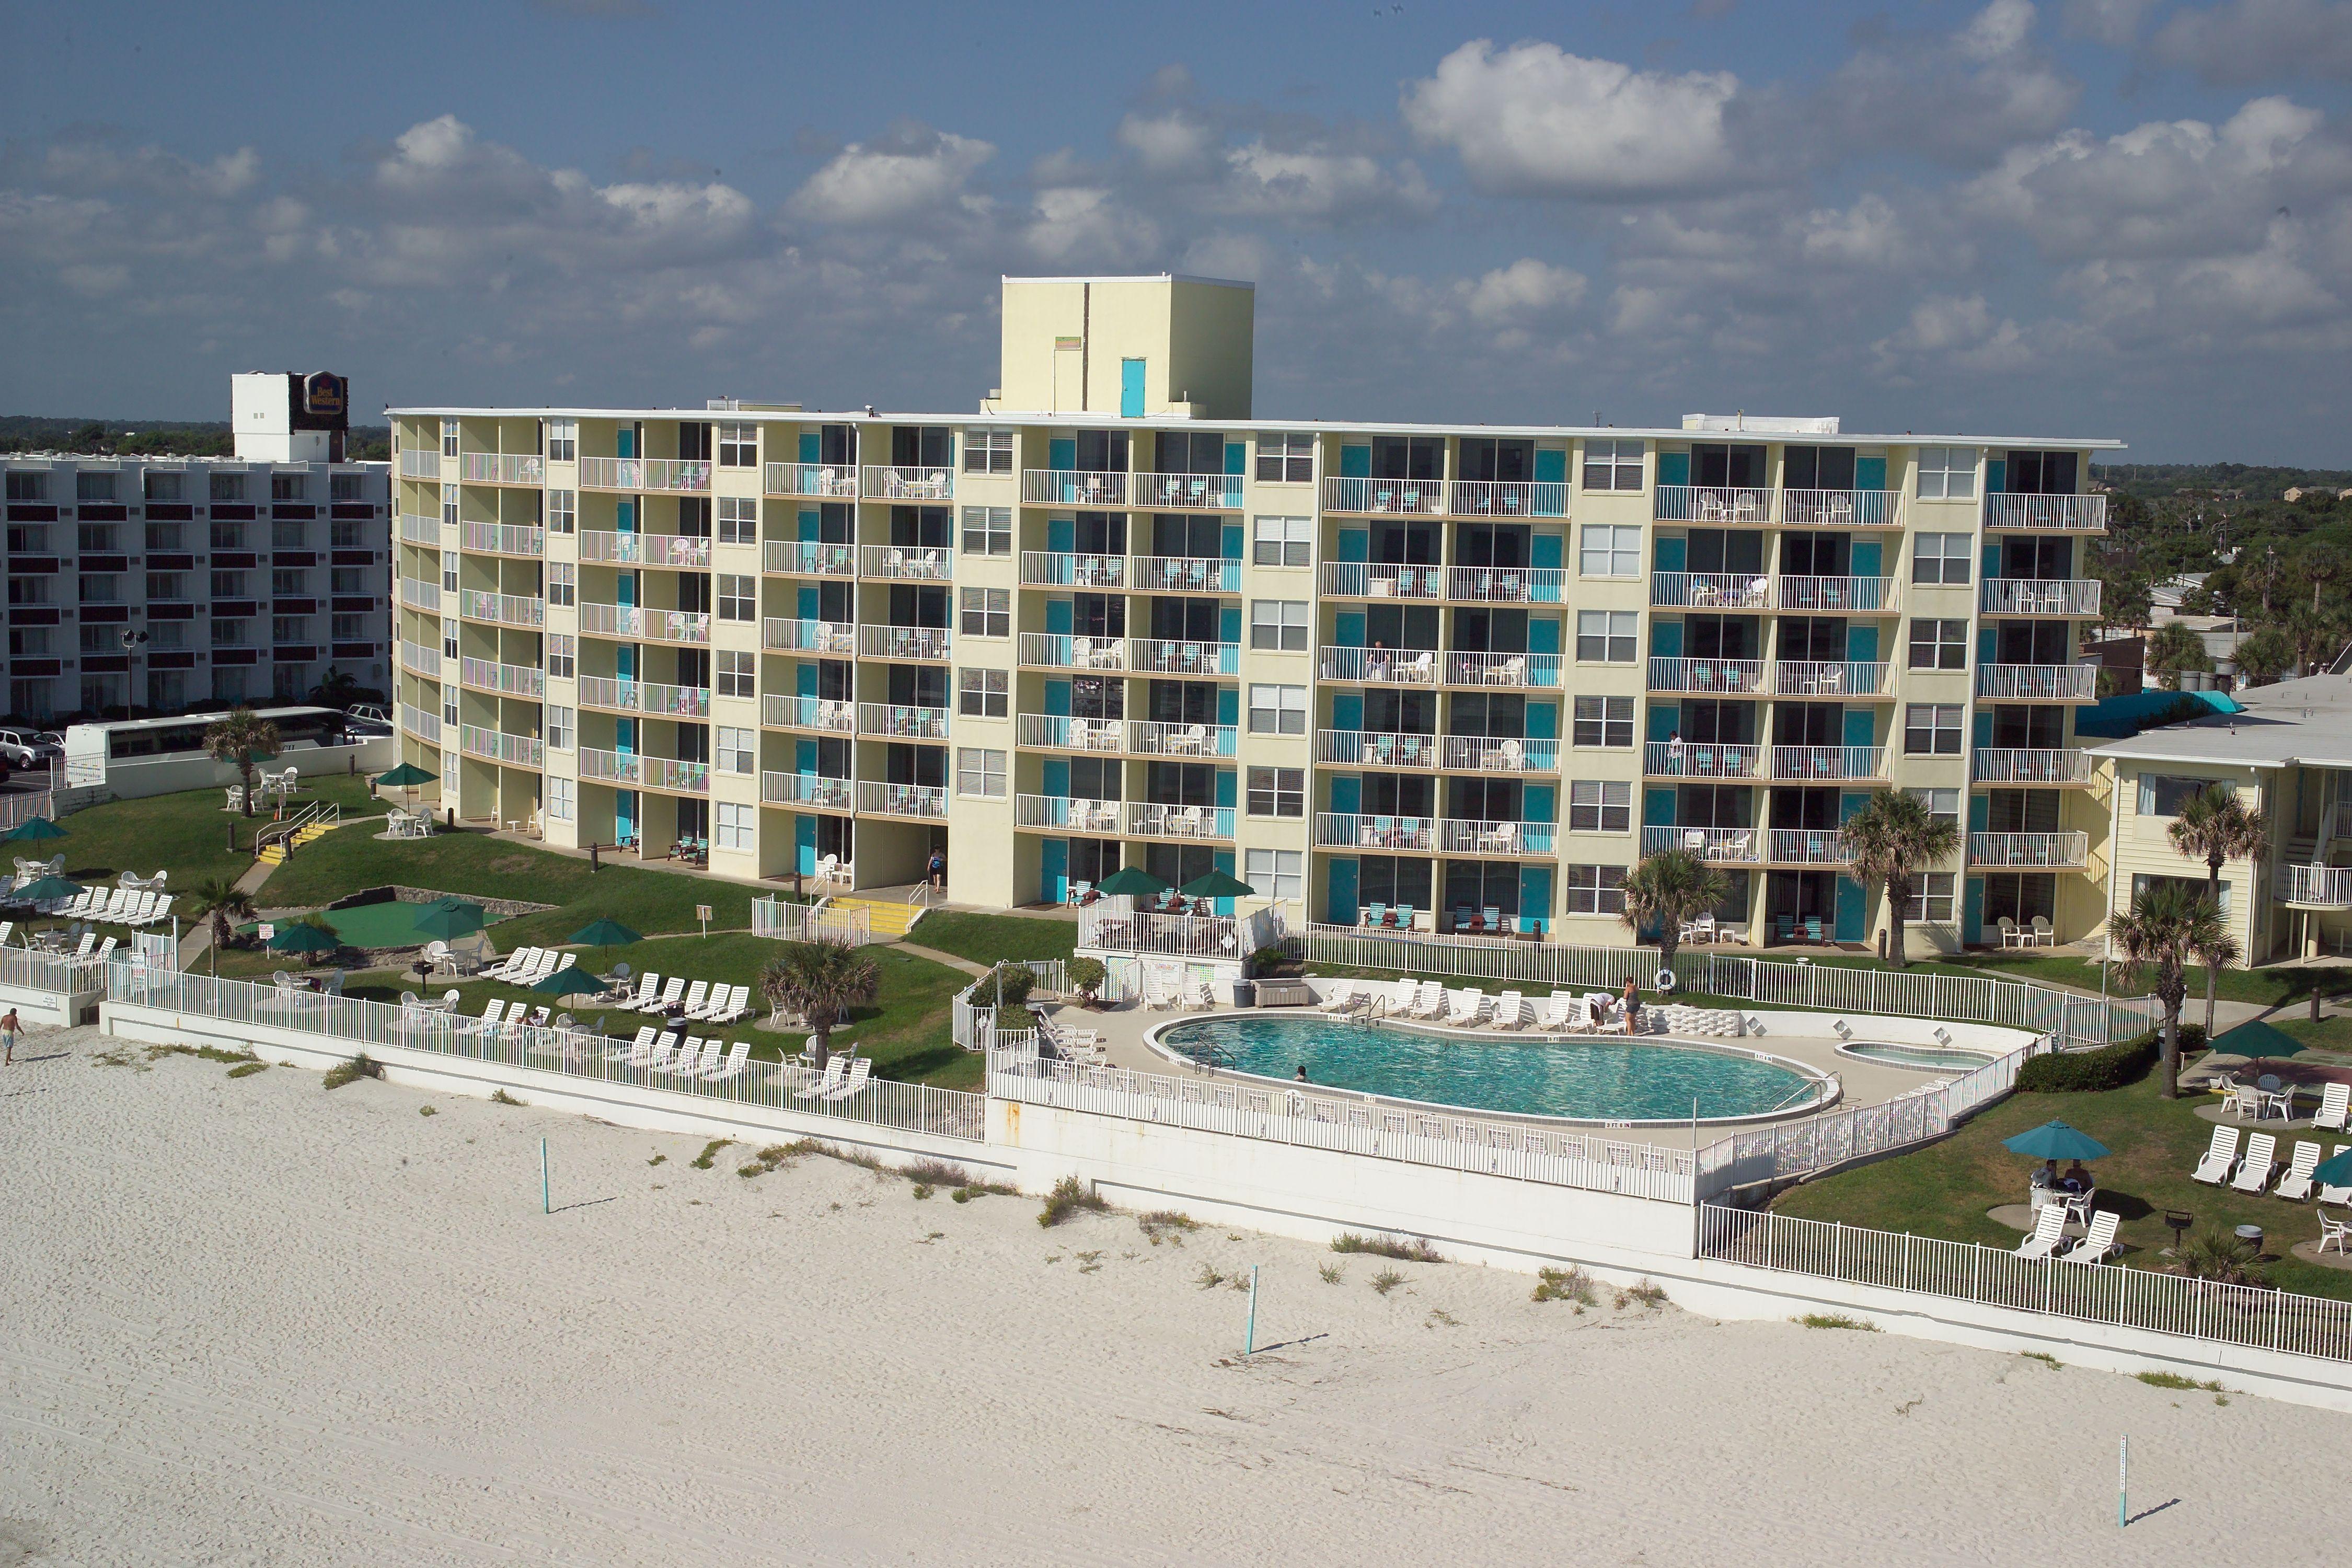 Perry S Daytona Beach